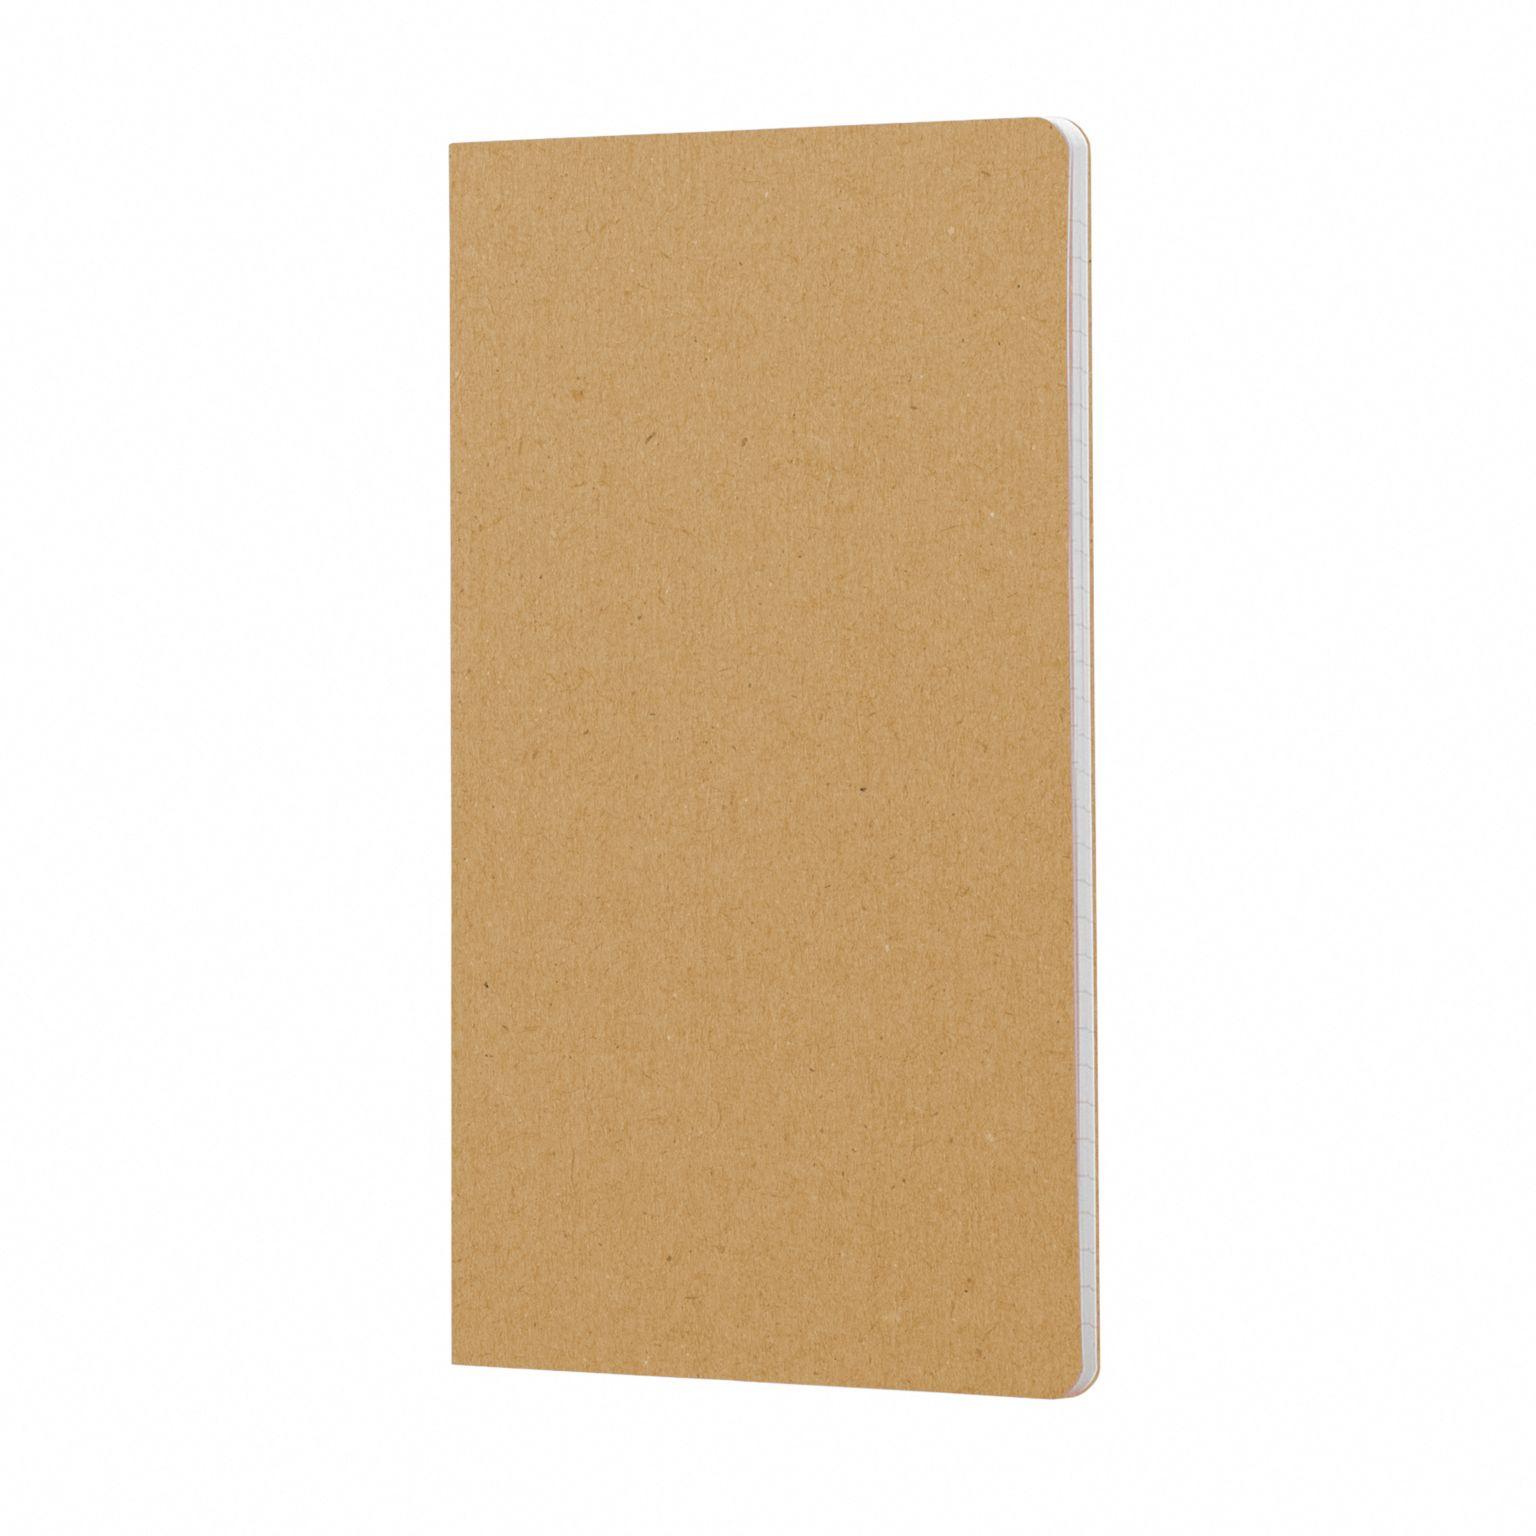 MOLESKINE® | Cahier Journal grand format avec papier à rayures